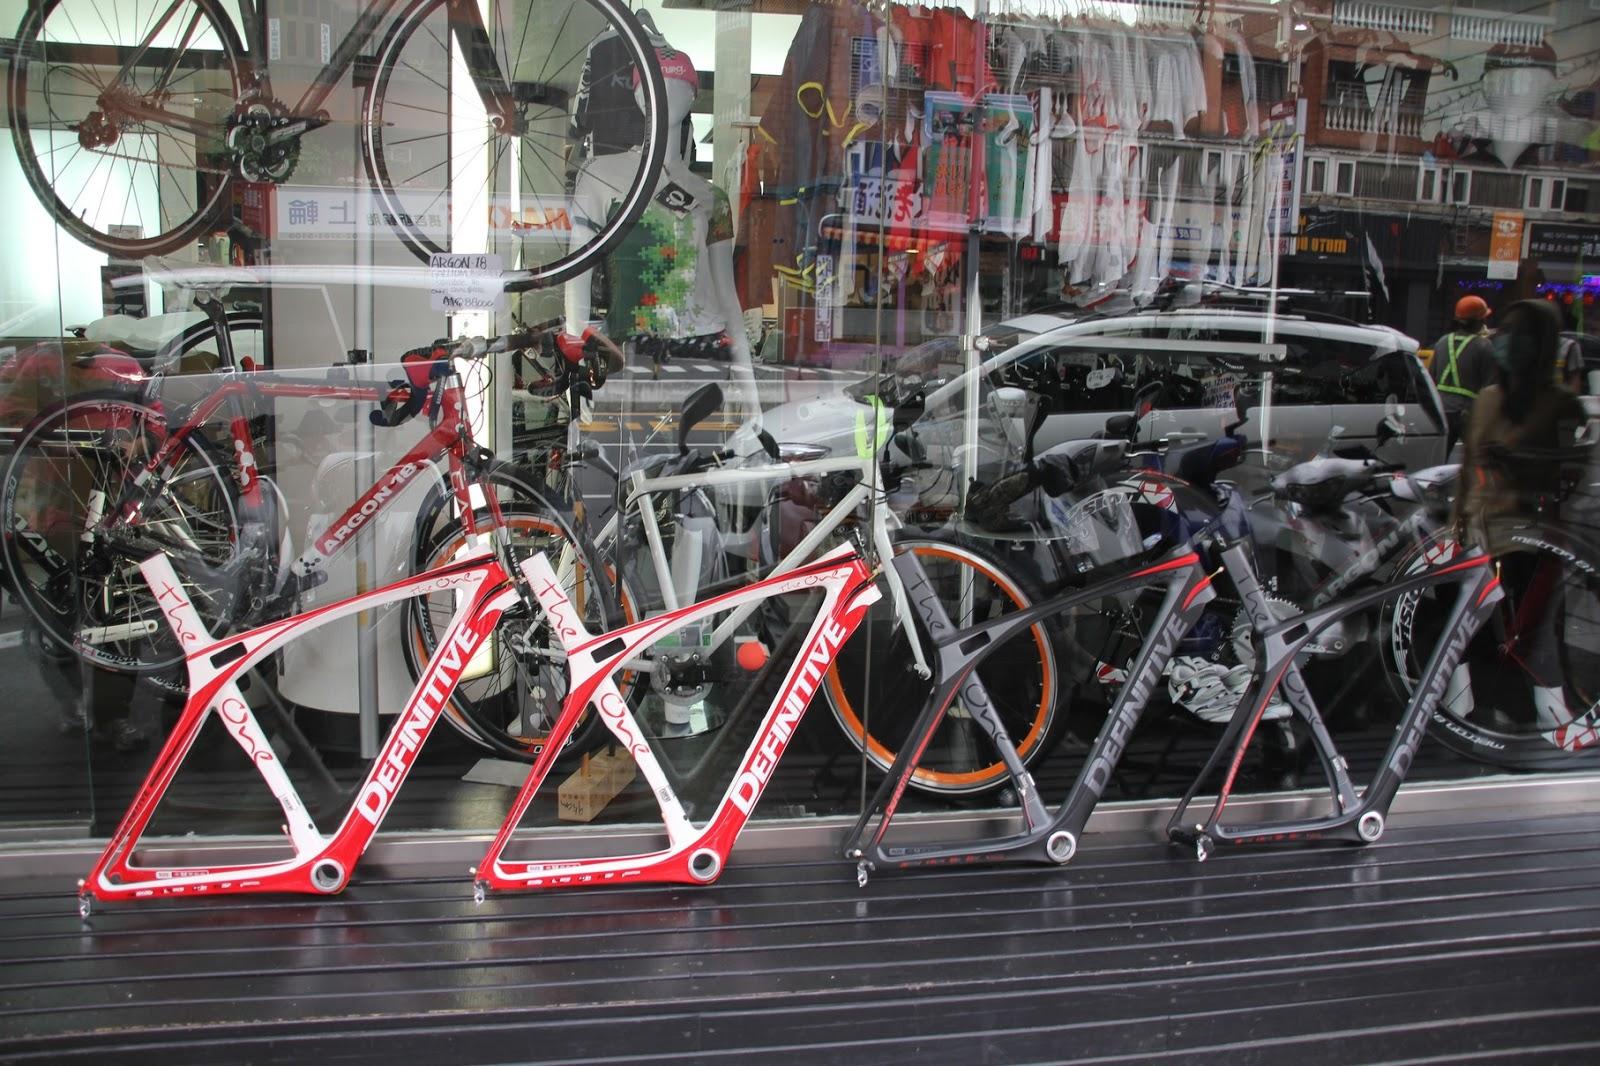 小偉單車: 2013 DEFINITIVE 亞洲首發 IN 七號公園 # 3